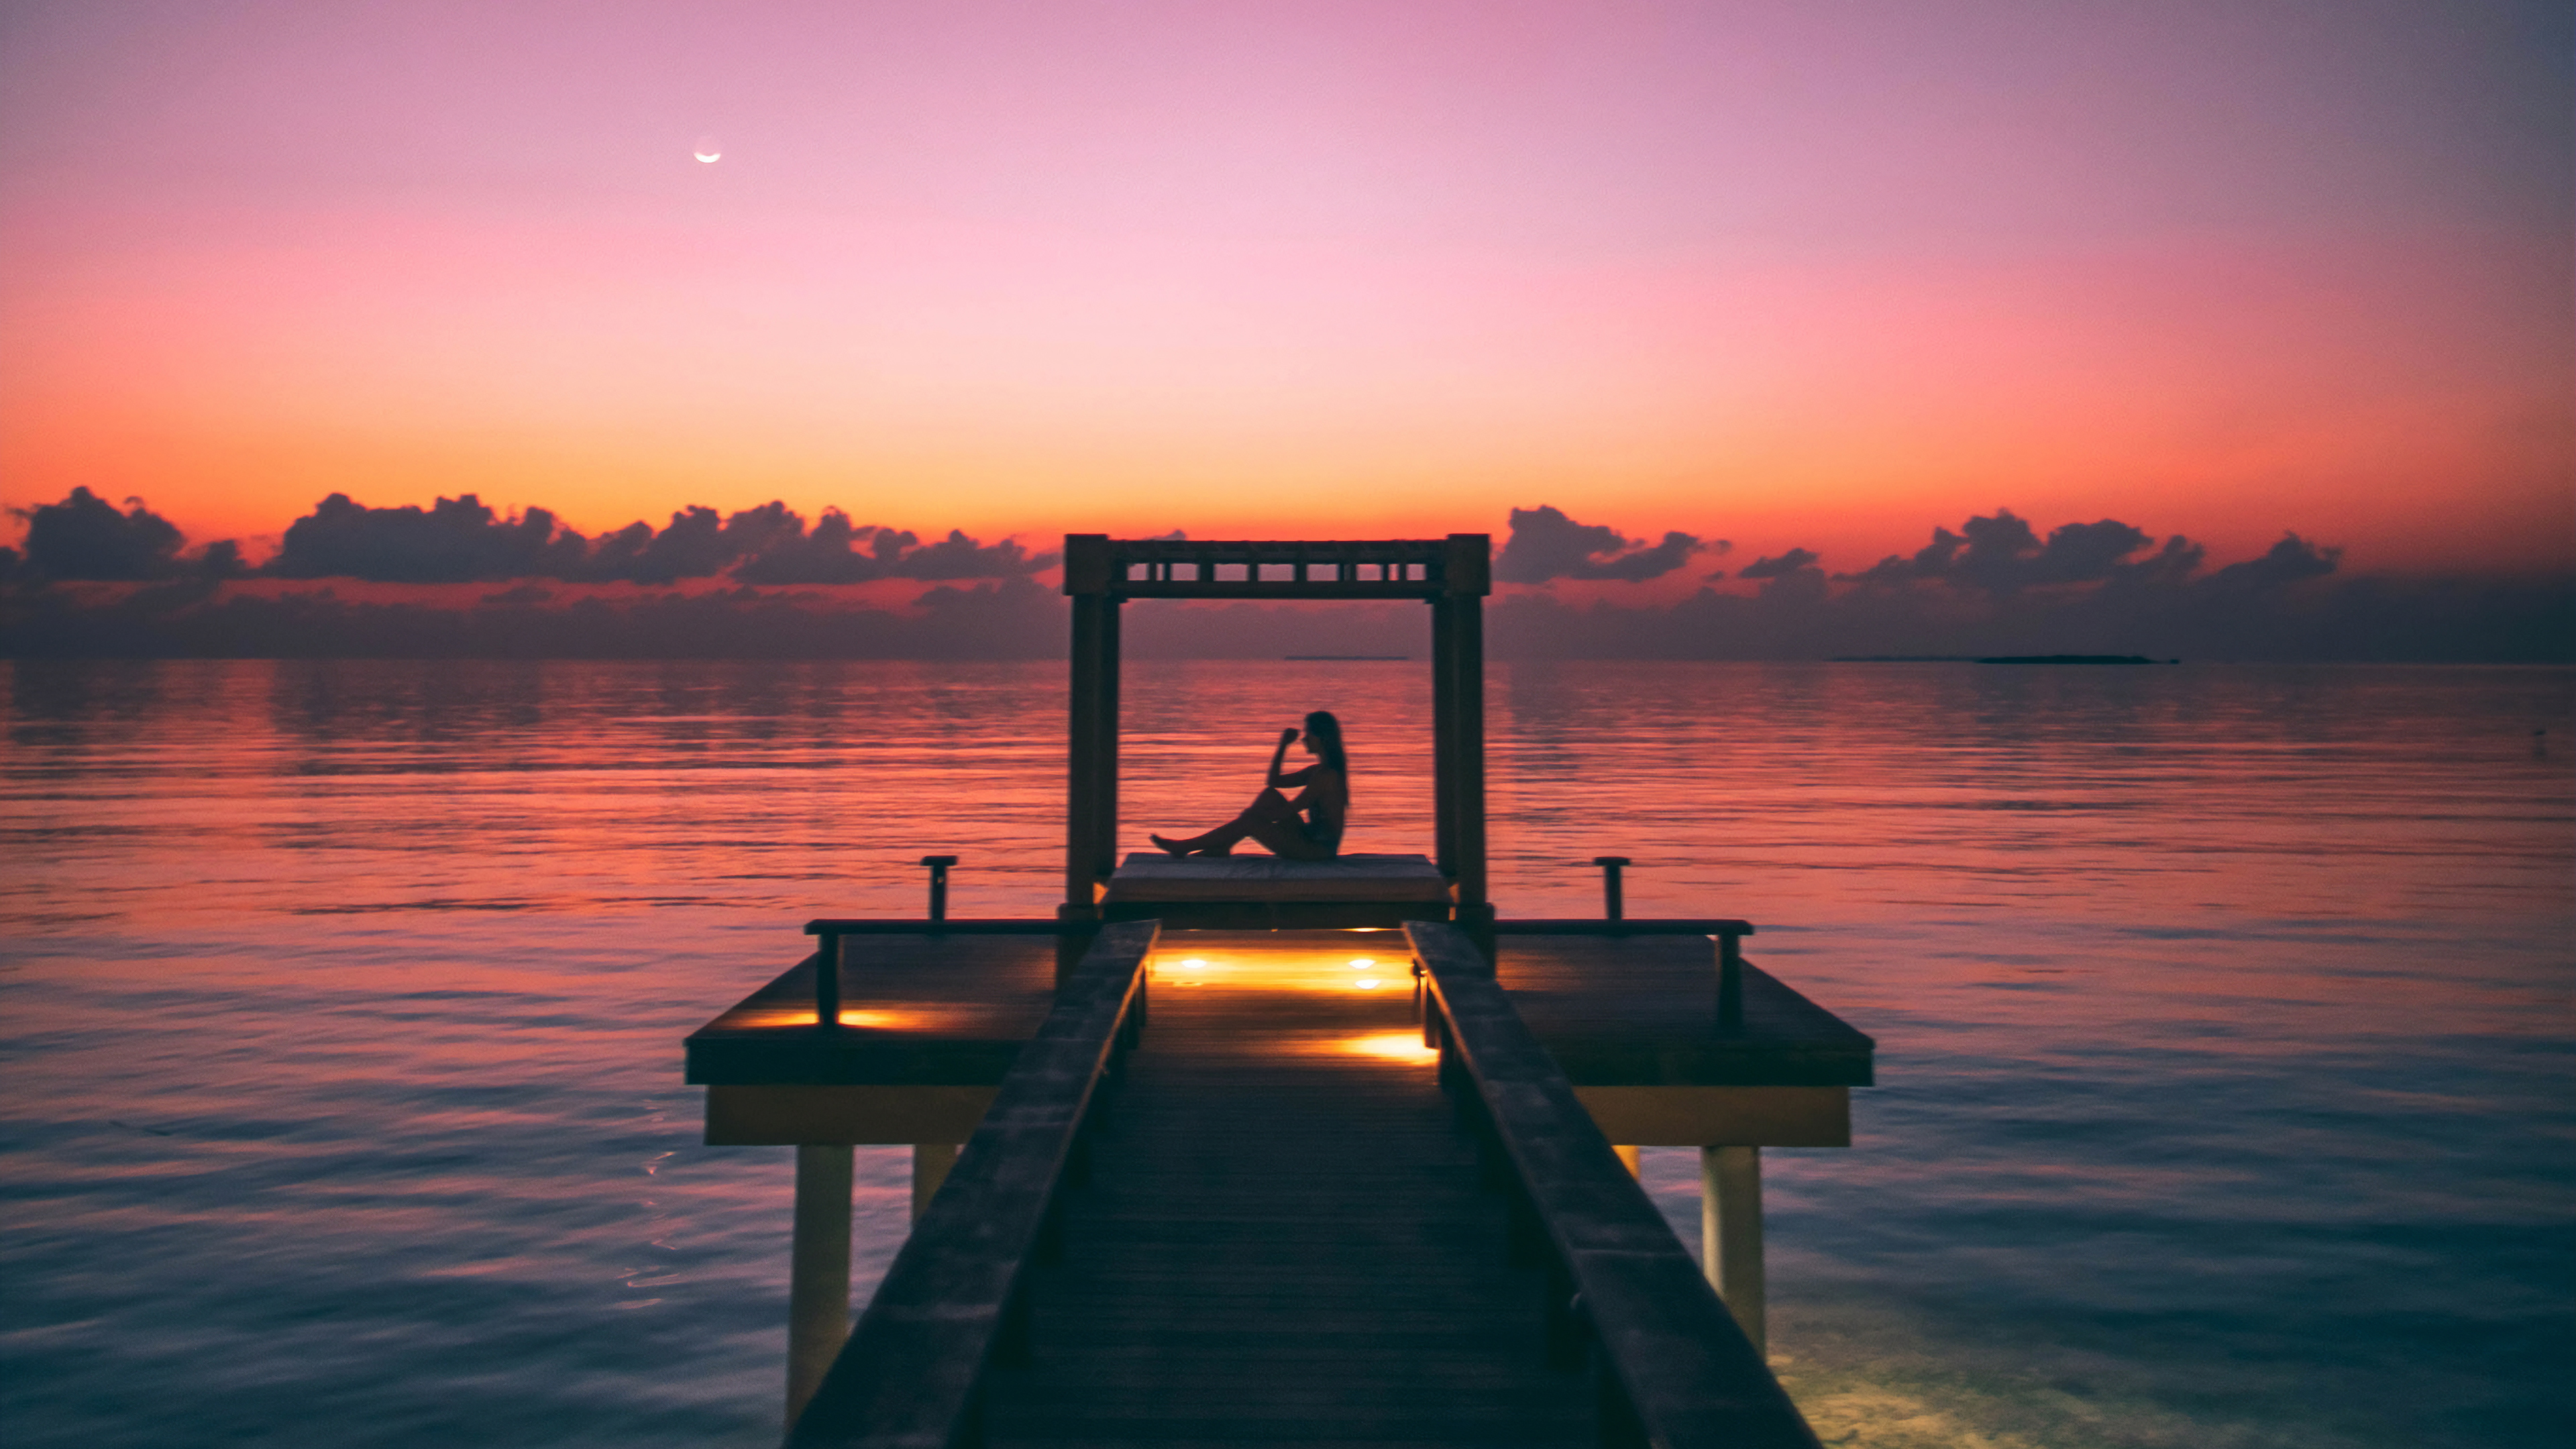 girl silhouette pier 1574938389 - Girl Silhouette Pier -